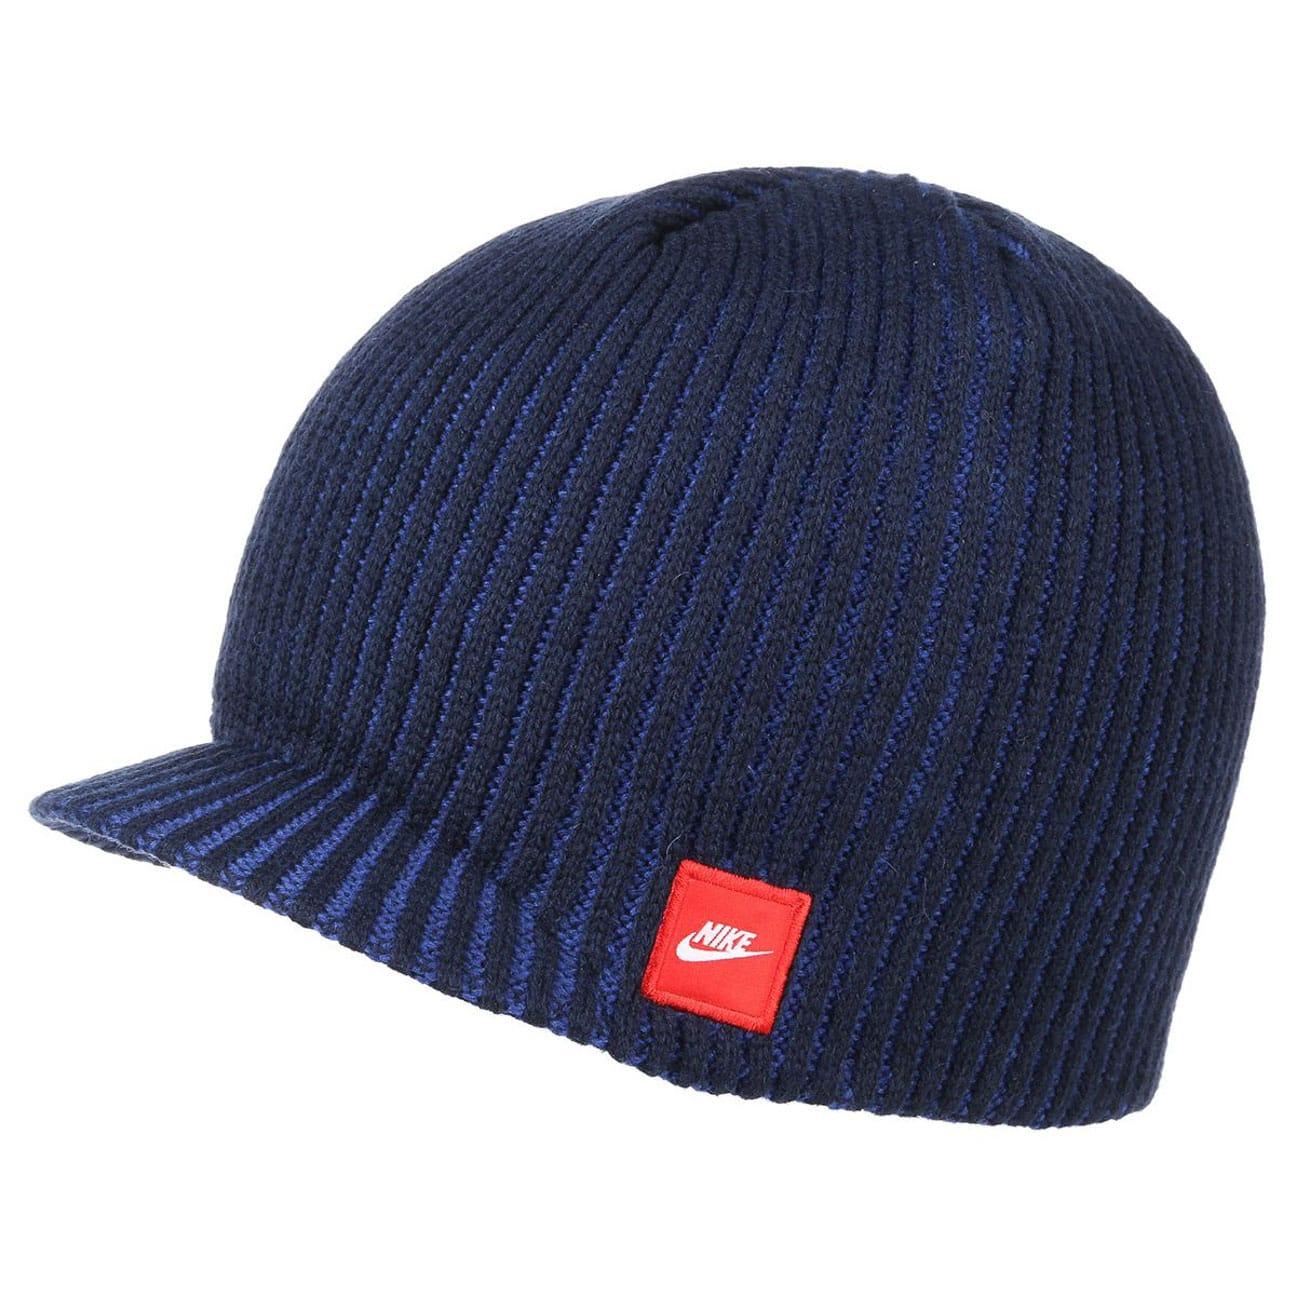 ea9416c7219 ... new arrivals rib peak pull on hat by nike blue 1 4104f 58ae5